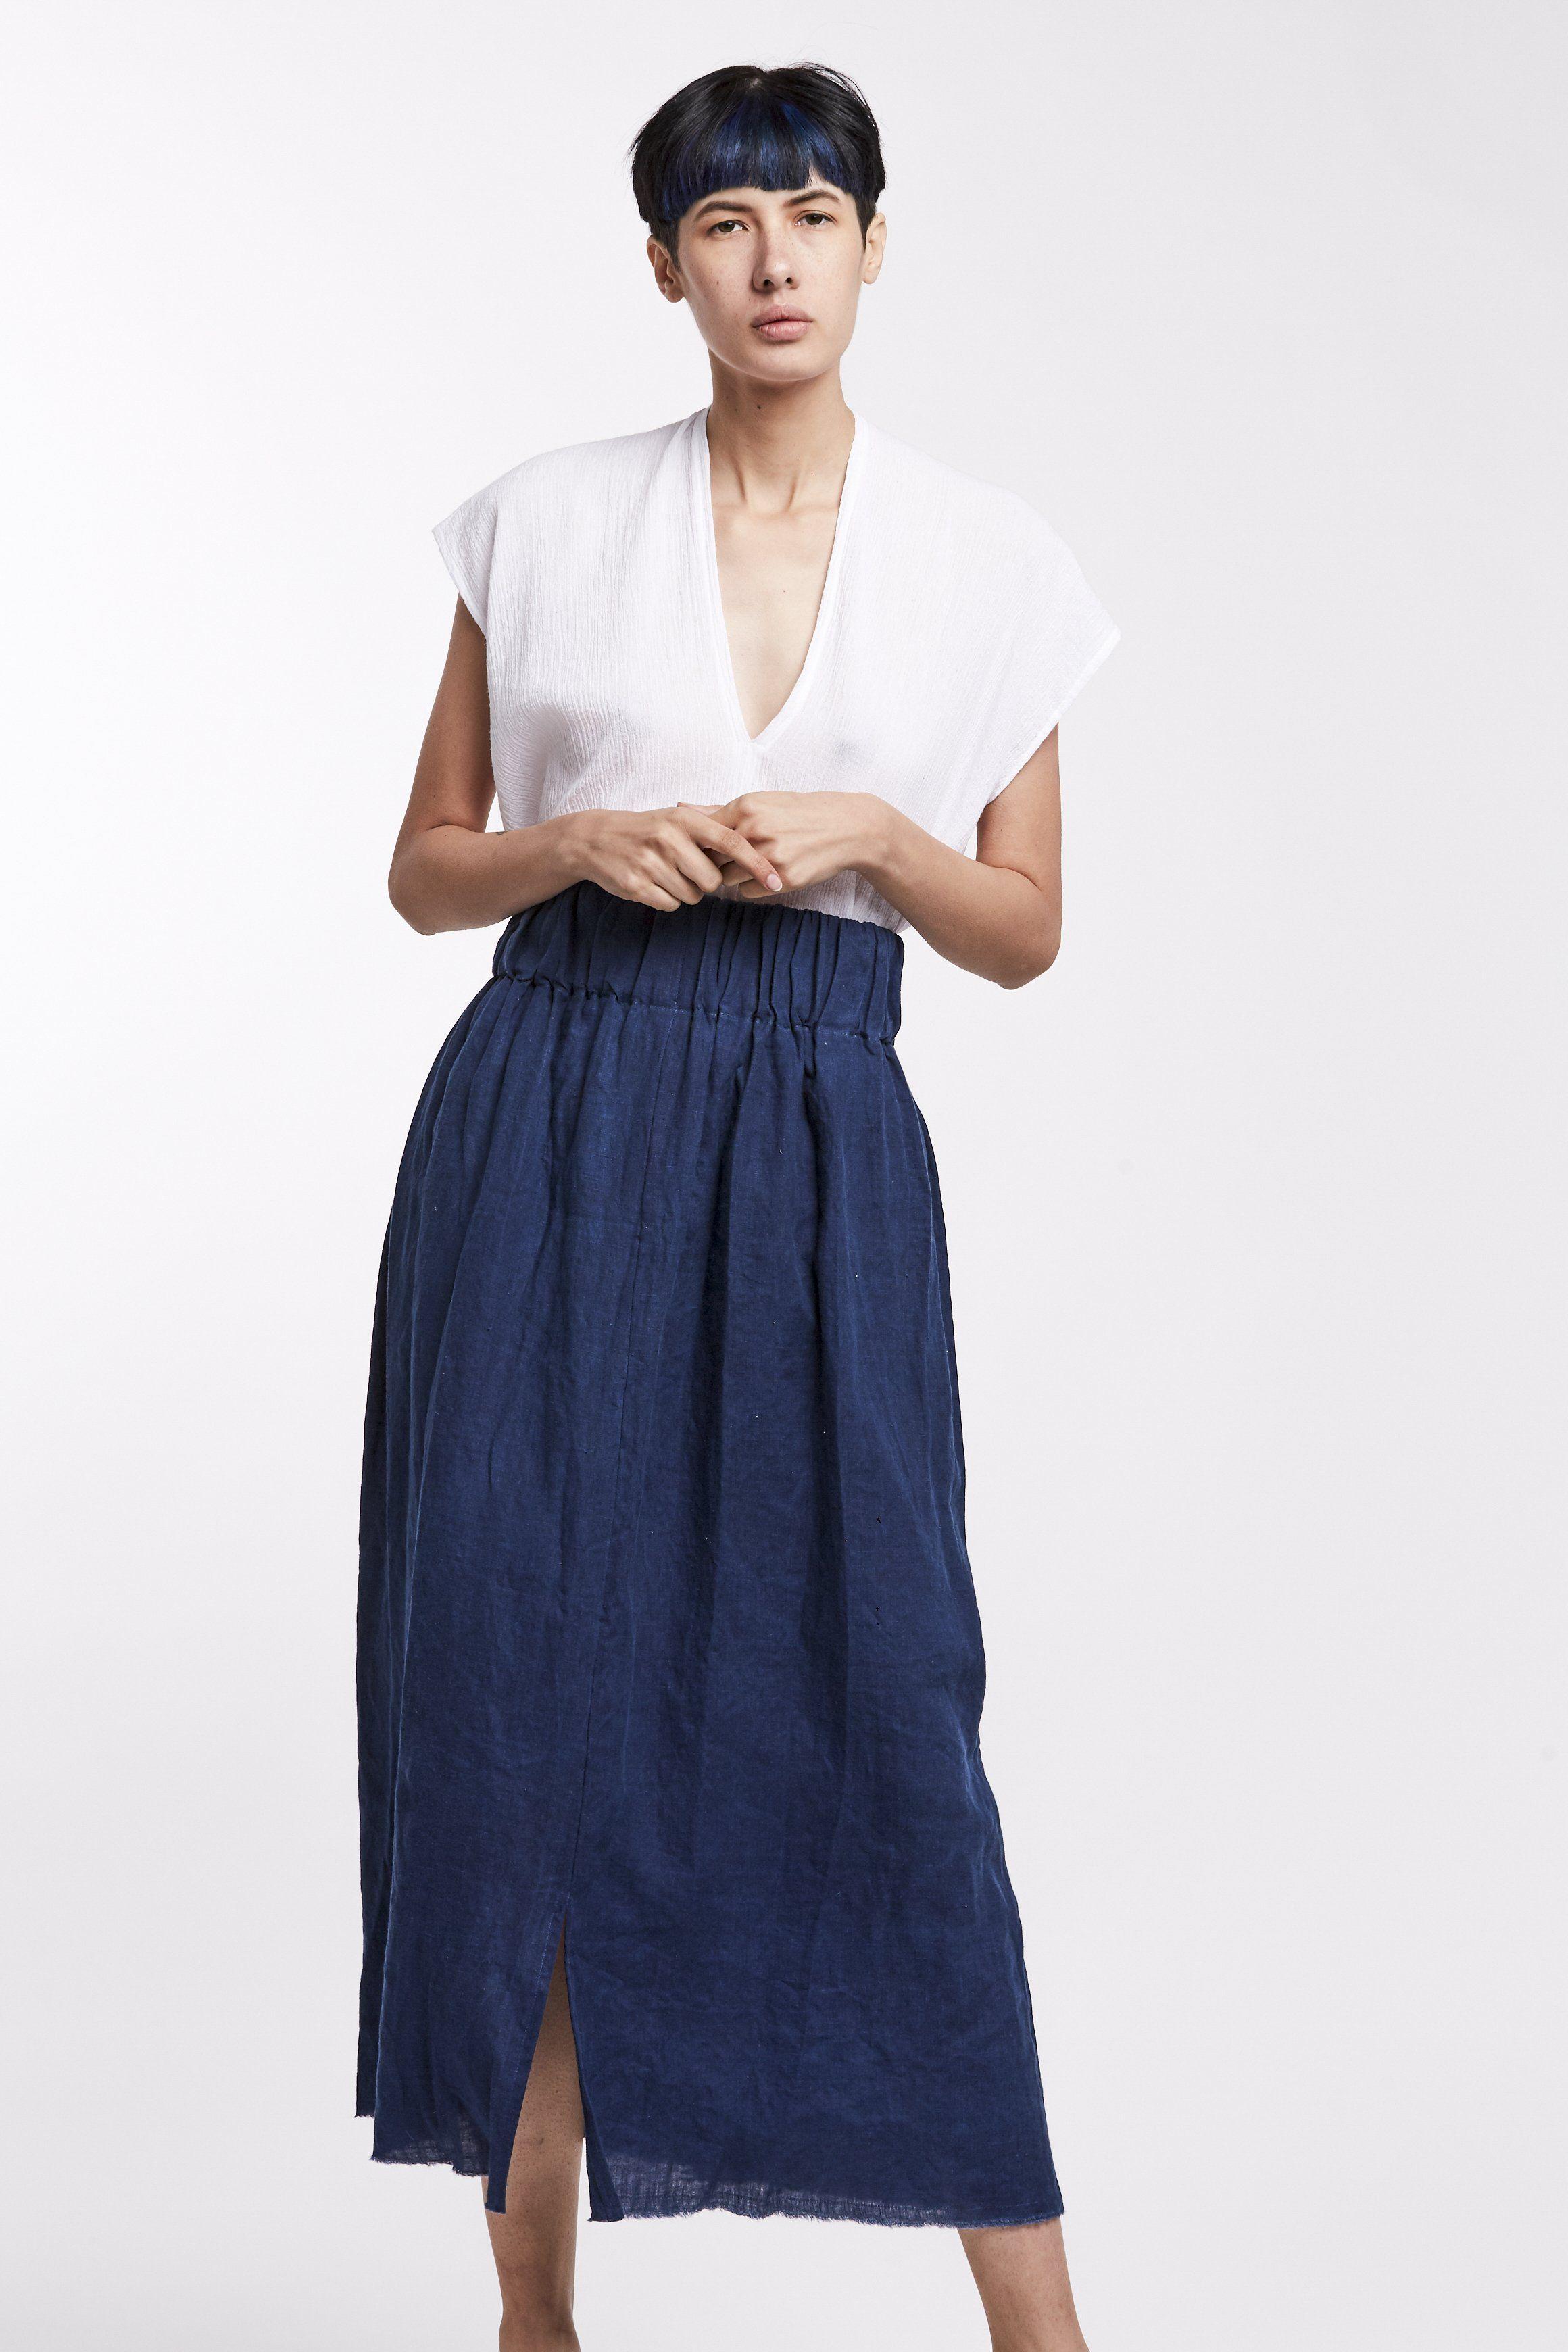 69f448802d Paper Bag Skirt, Linen in Dark Indigo - In-Stock: Ships in 1 to 3 ...